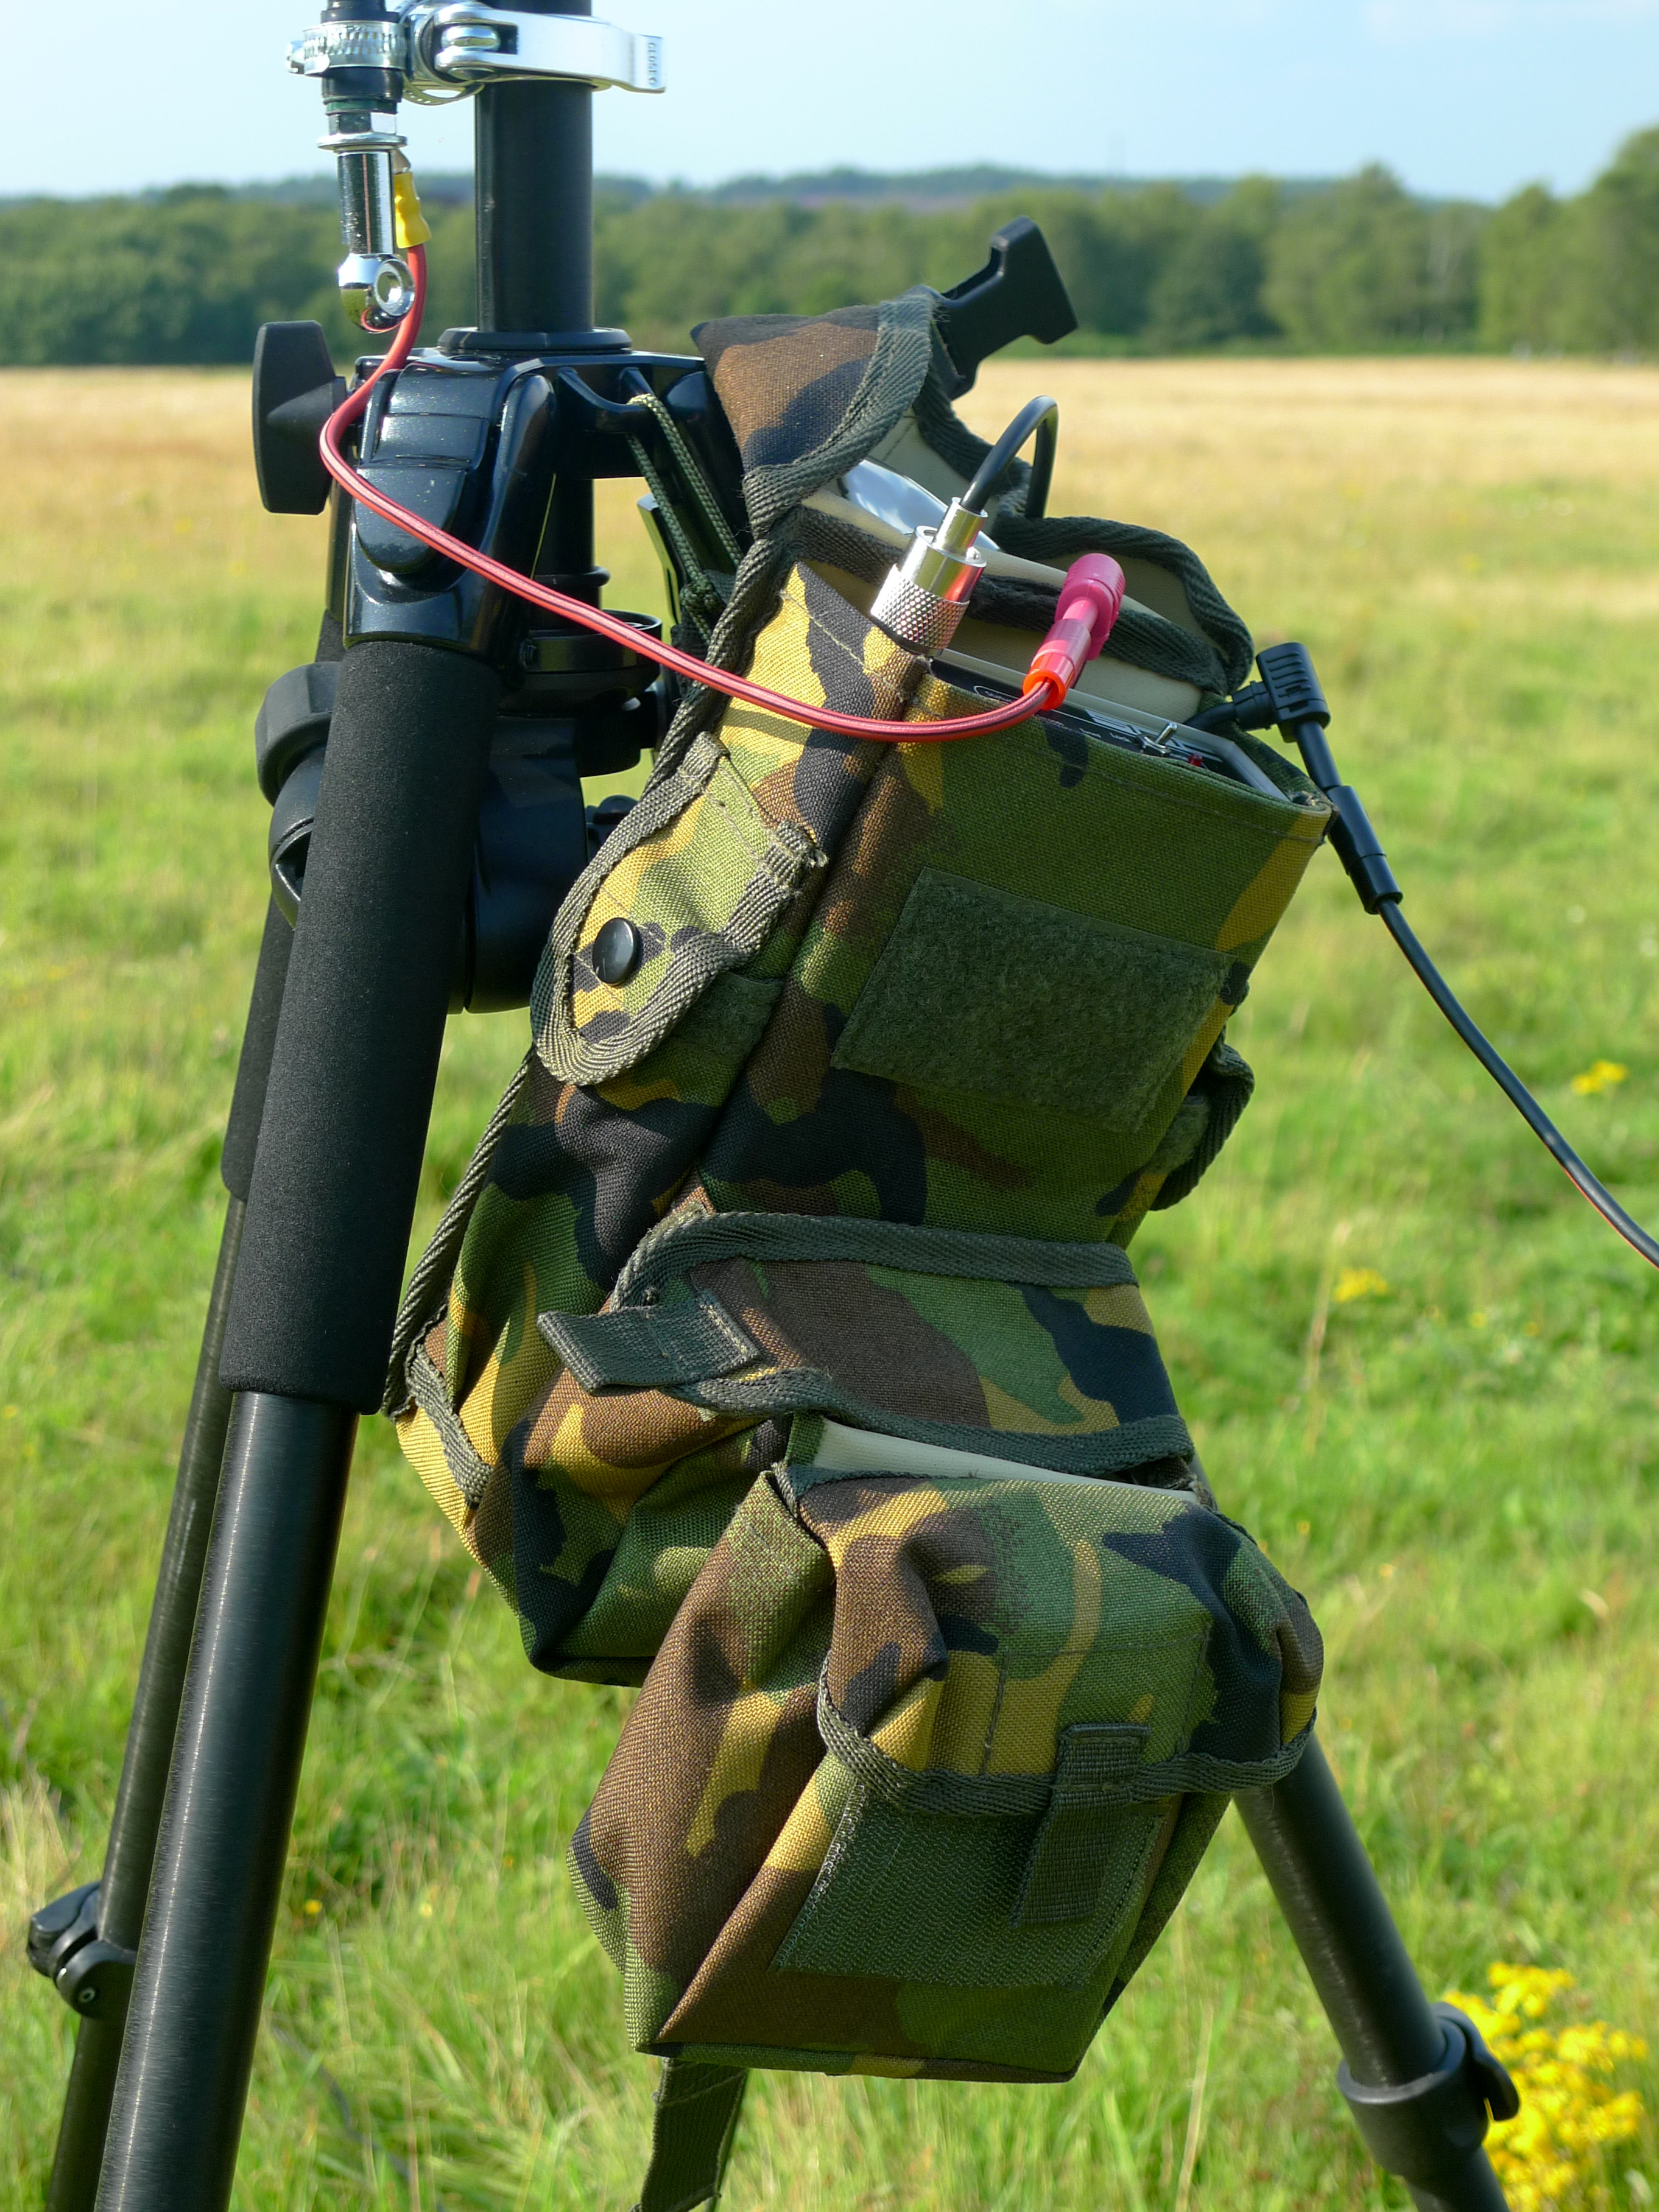 Fast Setup Portable Vertical Antenna Way Switches Explained Alloutputcom Military Trauma Pouch Housing The Sgc Sg 211 Atu